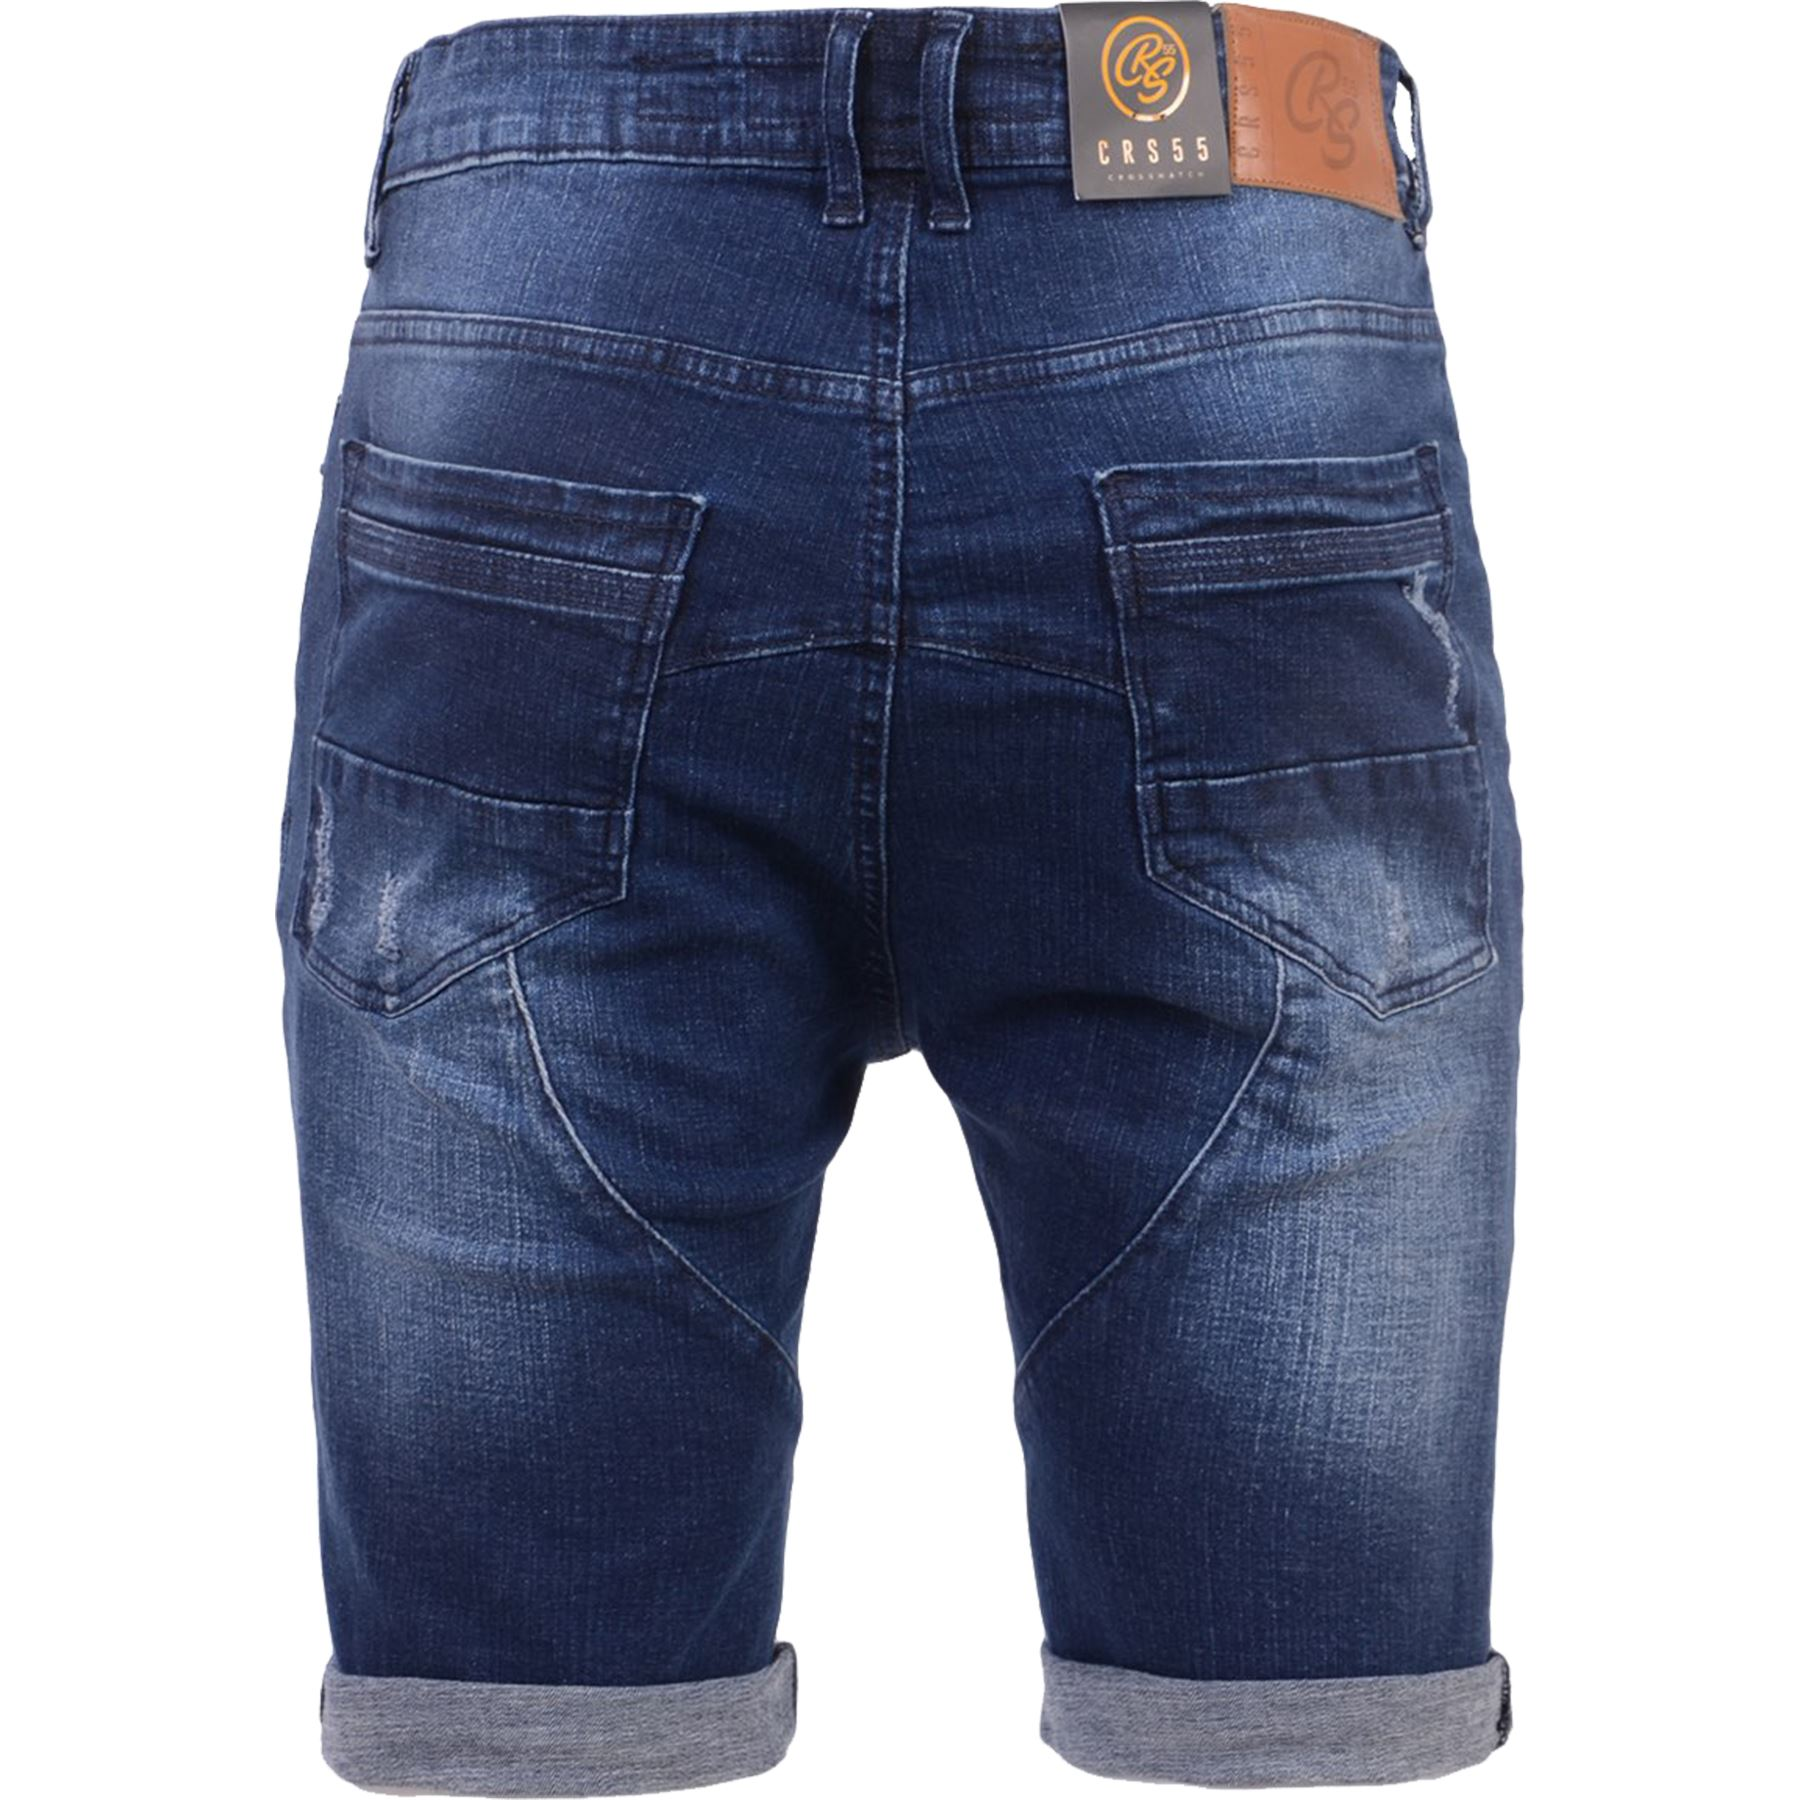 New-Mens-Crosshatch-Canvas-Cargo-Denim-Camo-Shorts-Chino-2019-Styles-30-42-034 thumbnail 53